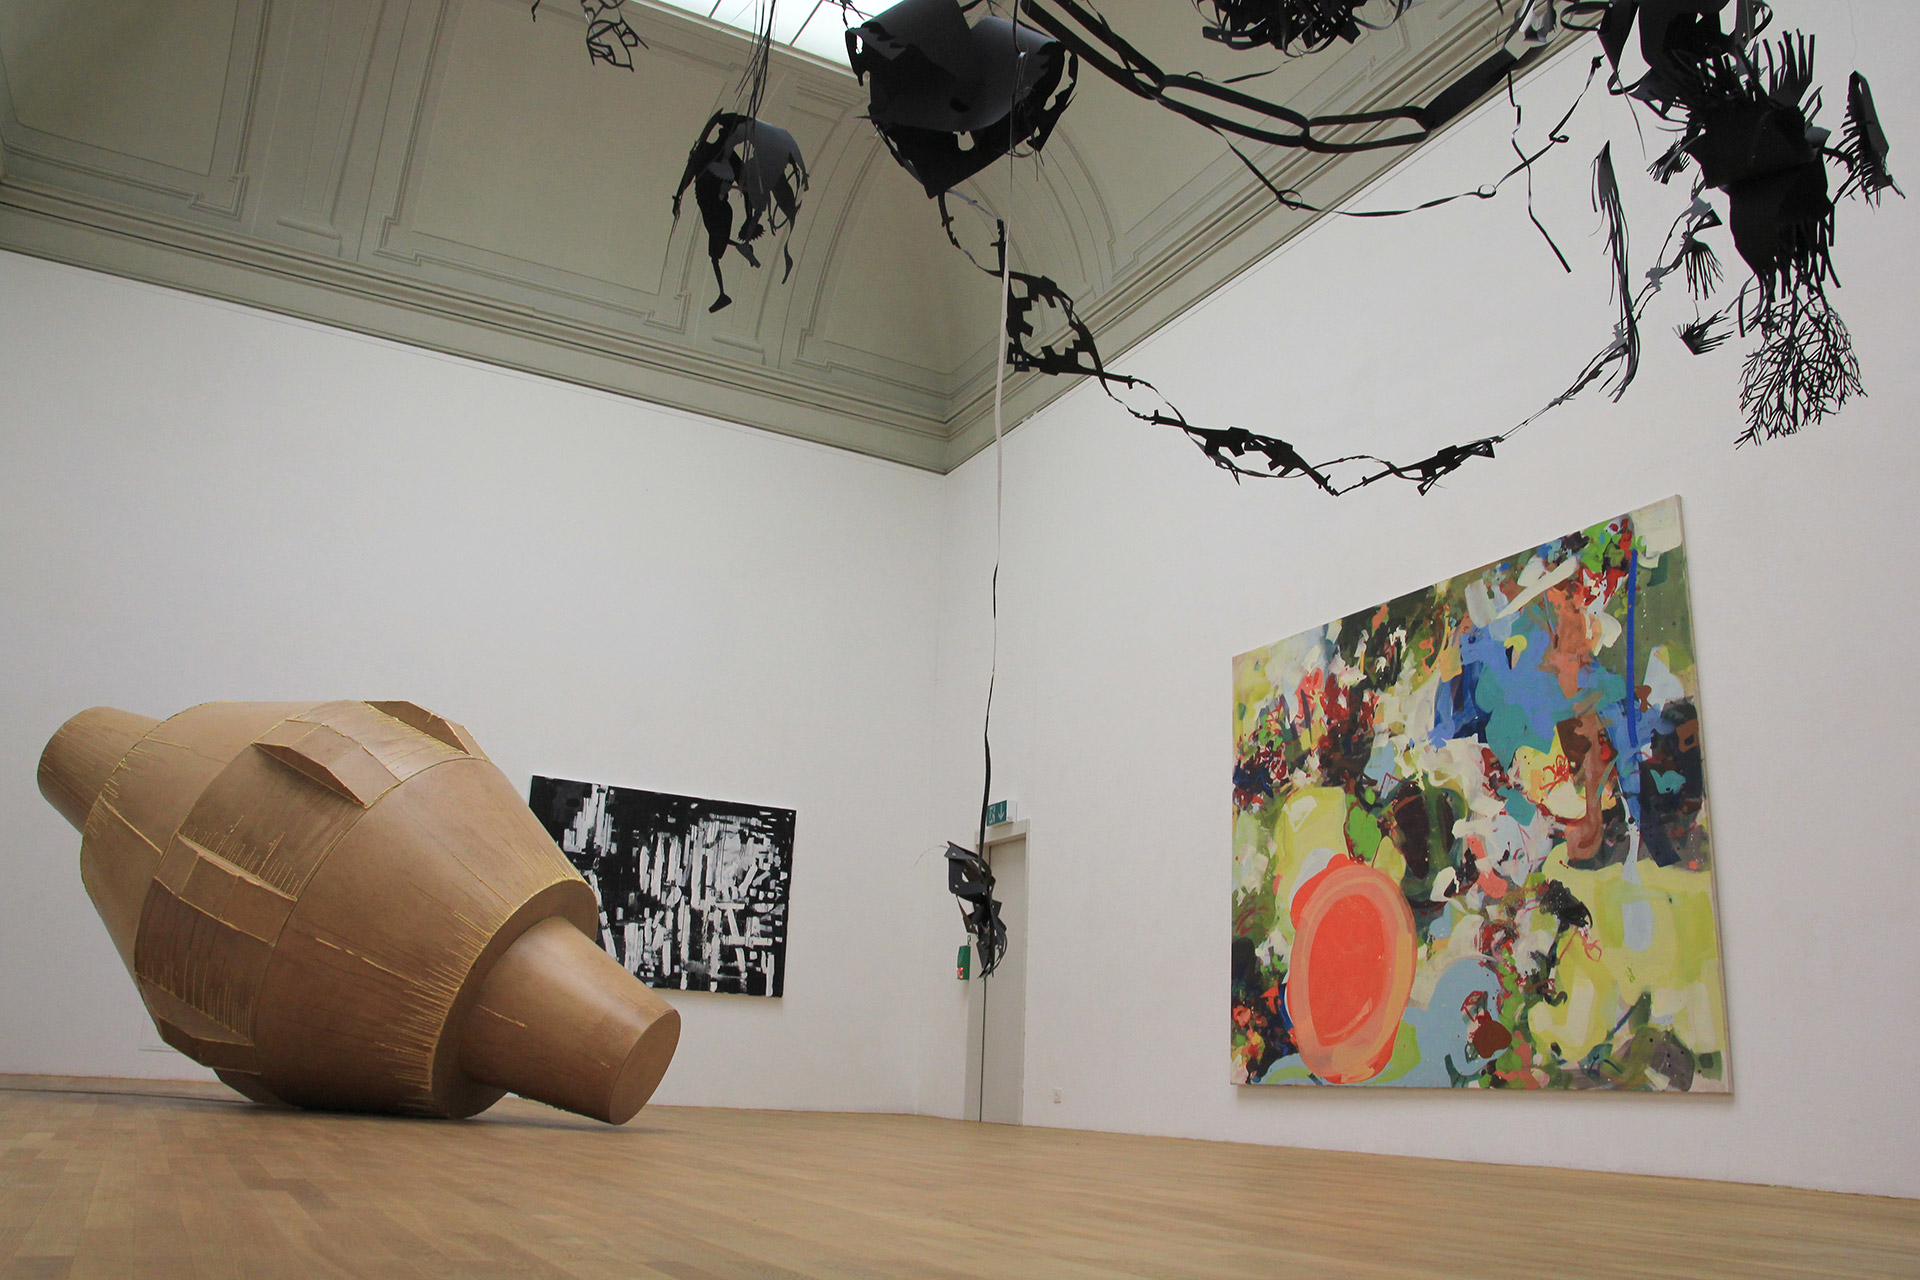 Dezember-Ausstellung-Kunsthalle-Winterthur-2013-3.jpg